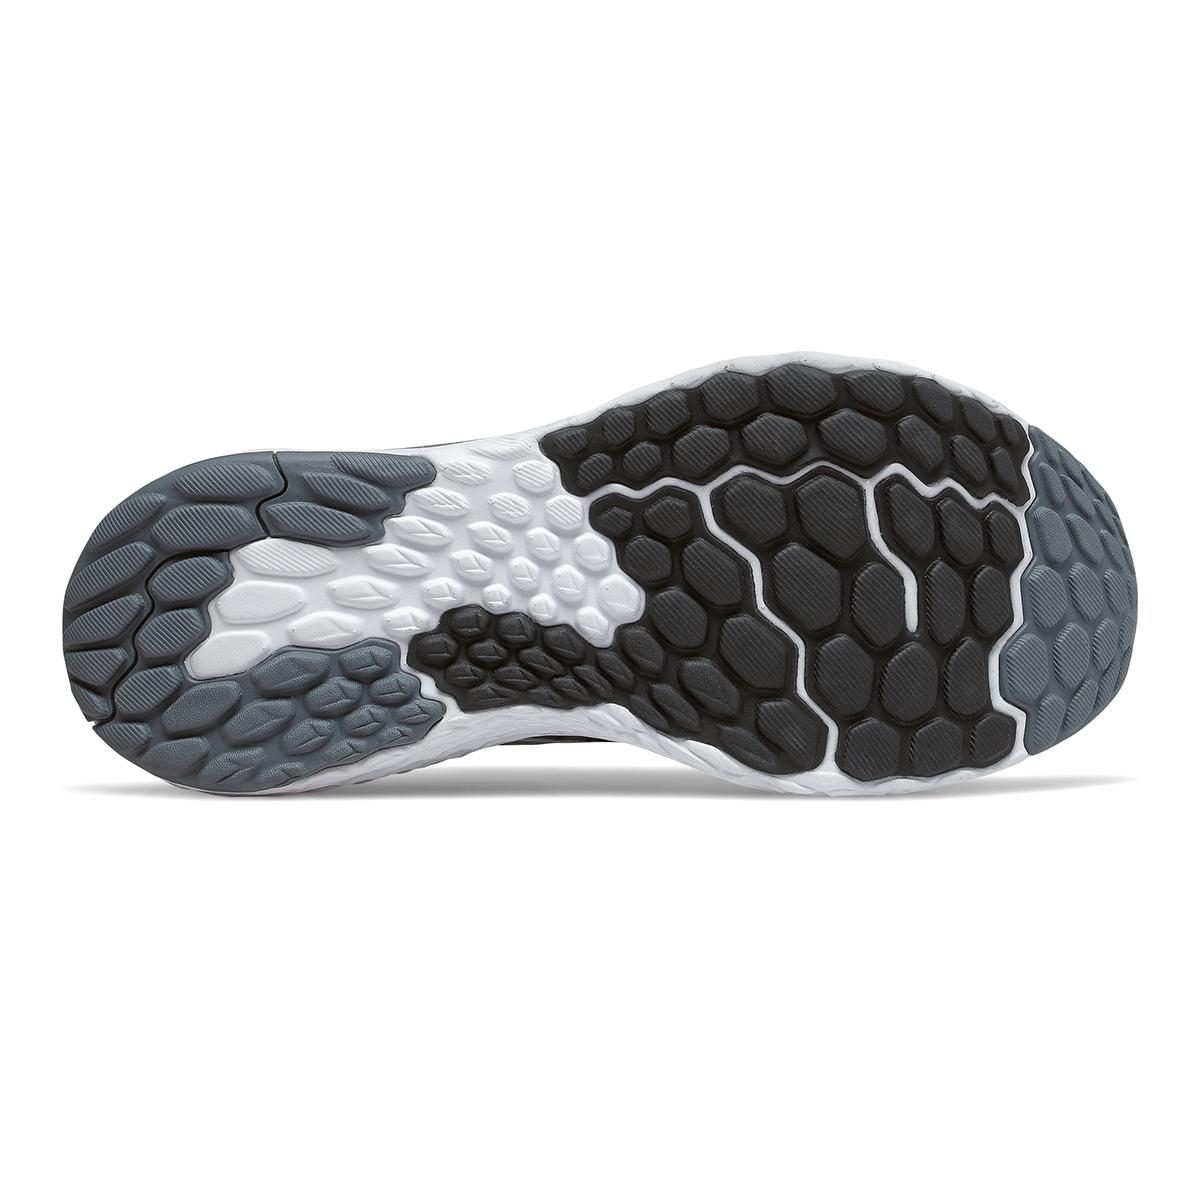 Men's New Balance Fresh Foam 1080v10 Running Shoe - Color: Lead - Size: 7 - Width: Wide, Lead, large, image 4